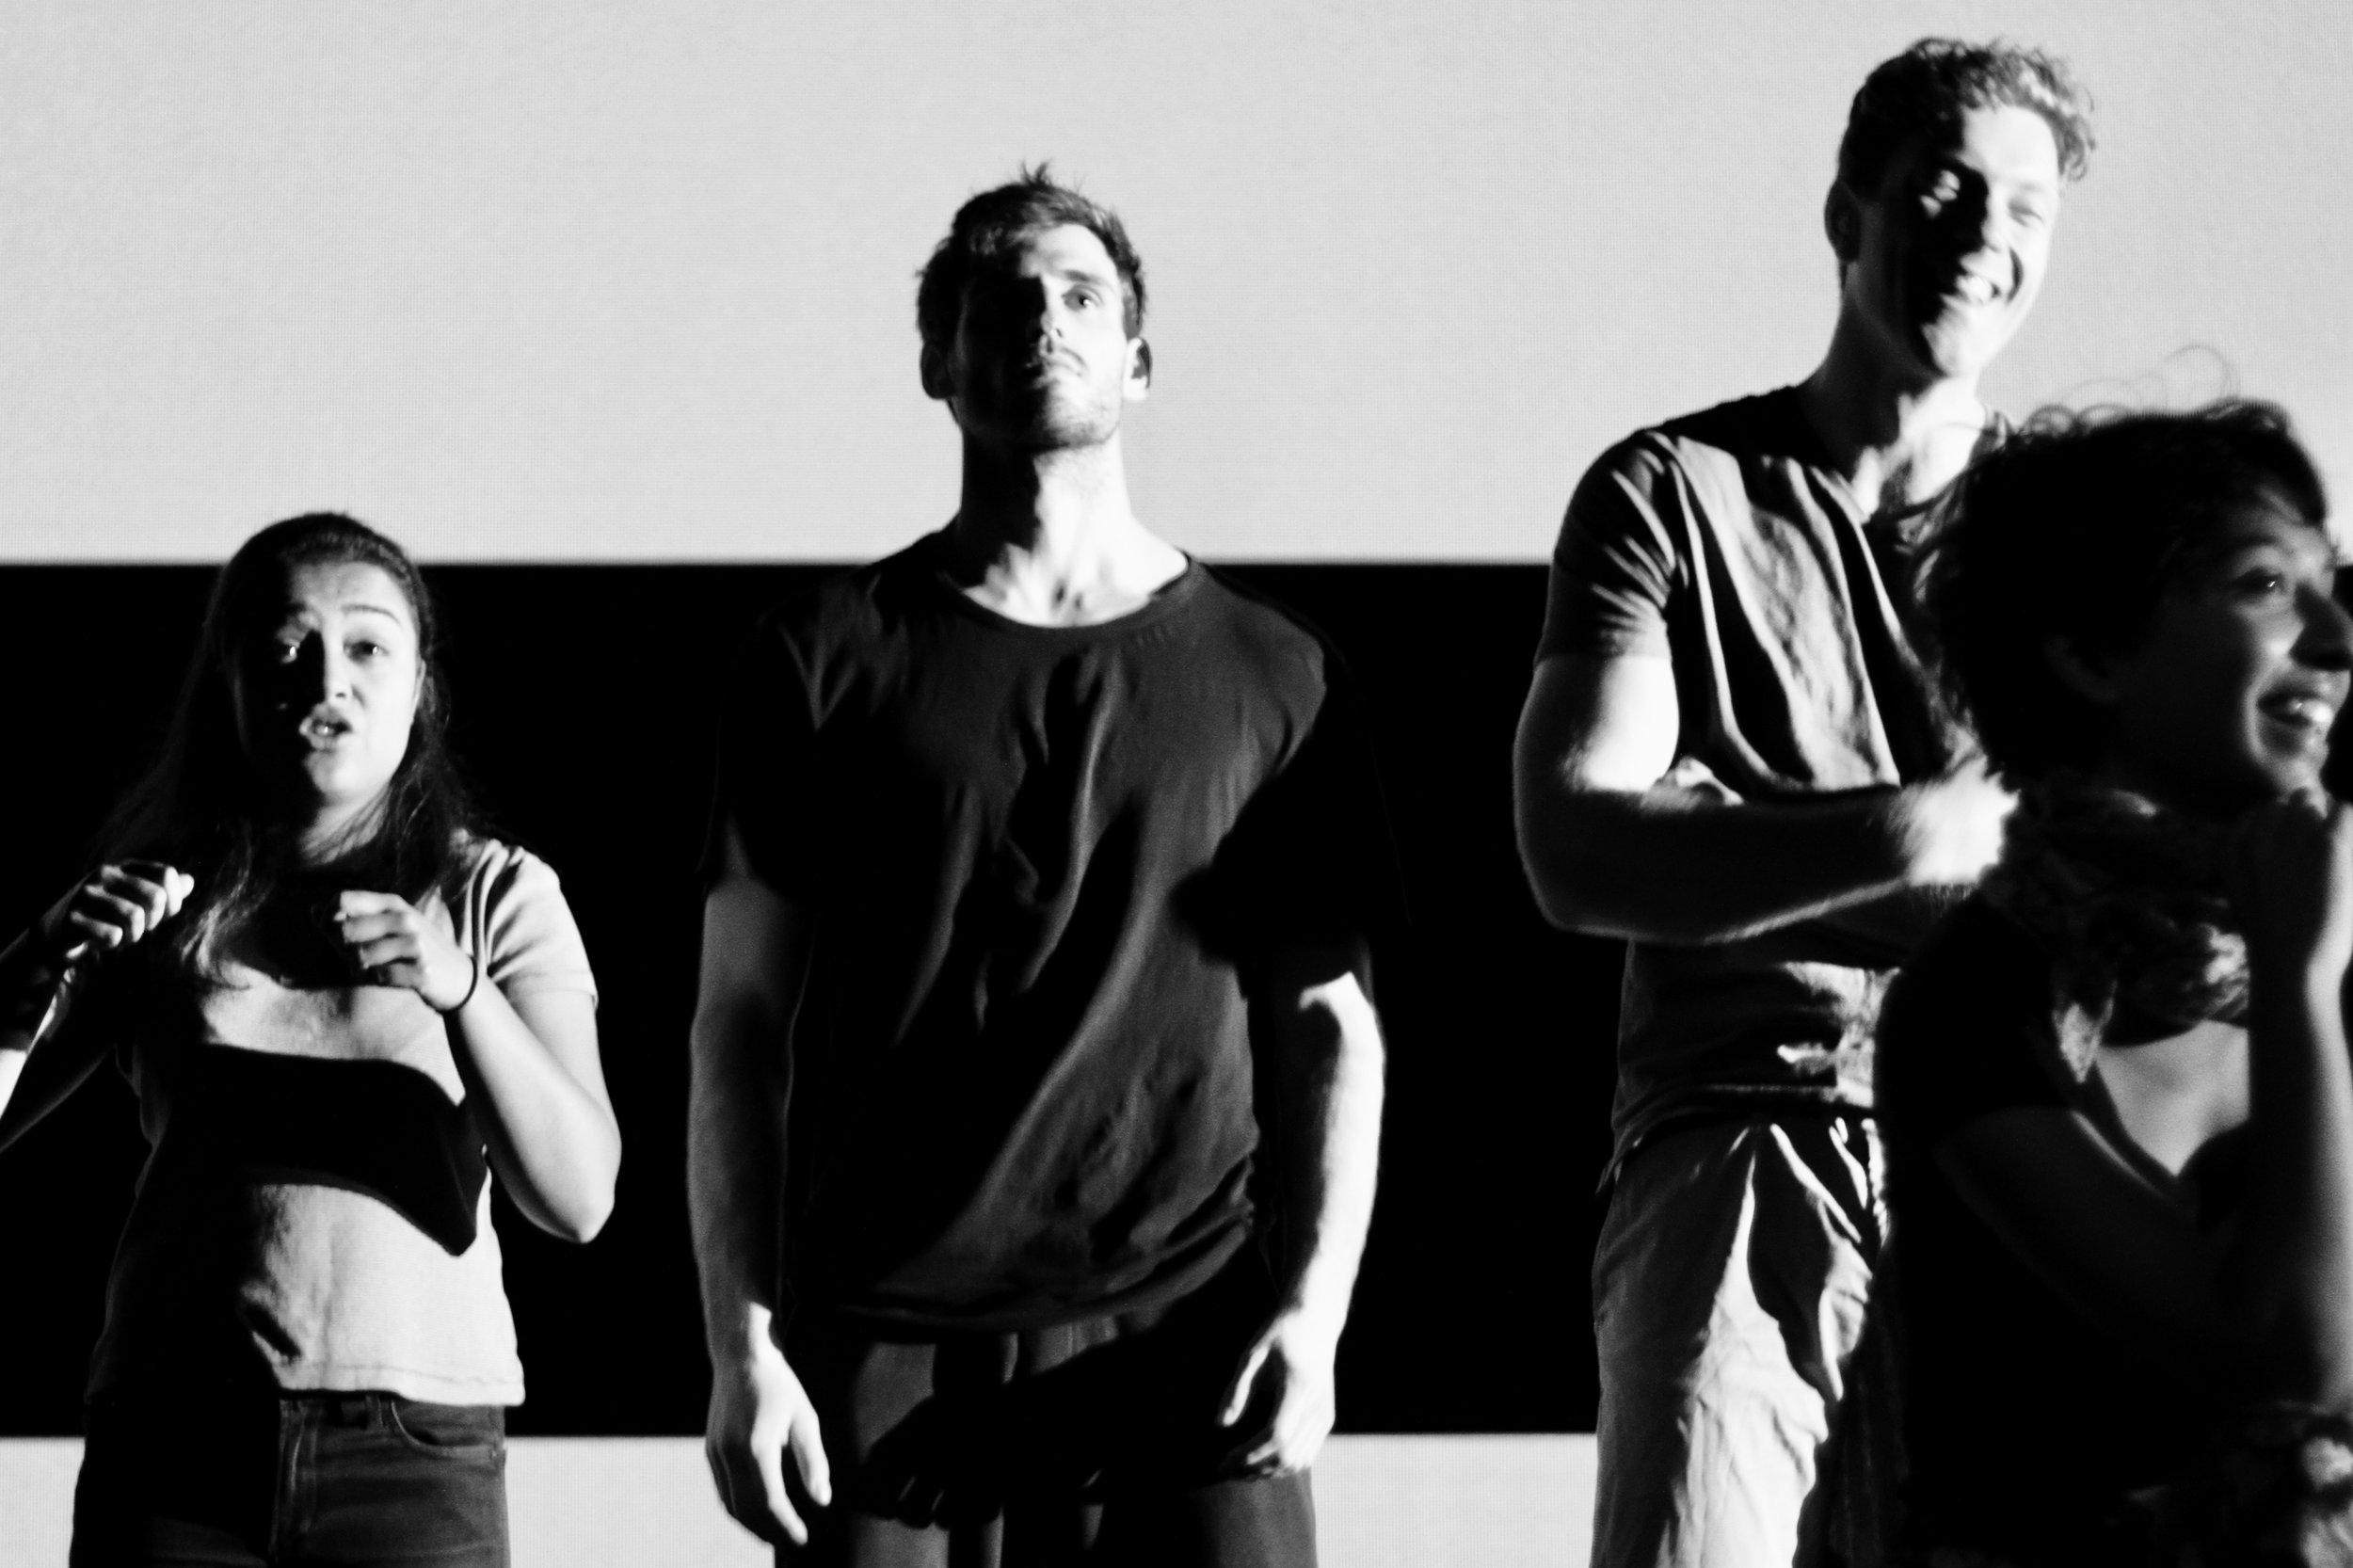 Nikita, Ethan, Jeremiah and Vaish - Love and Money, NIDA 2017 - photo by Anna McGrath